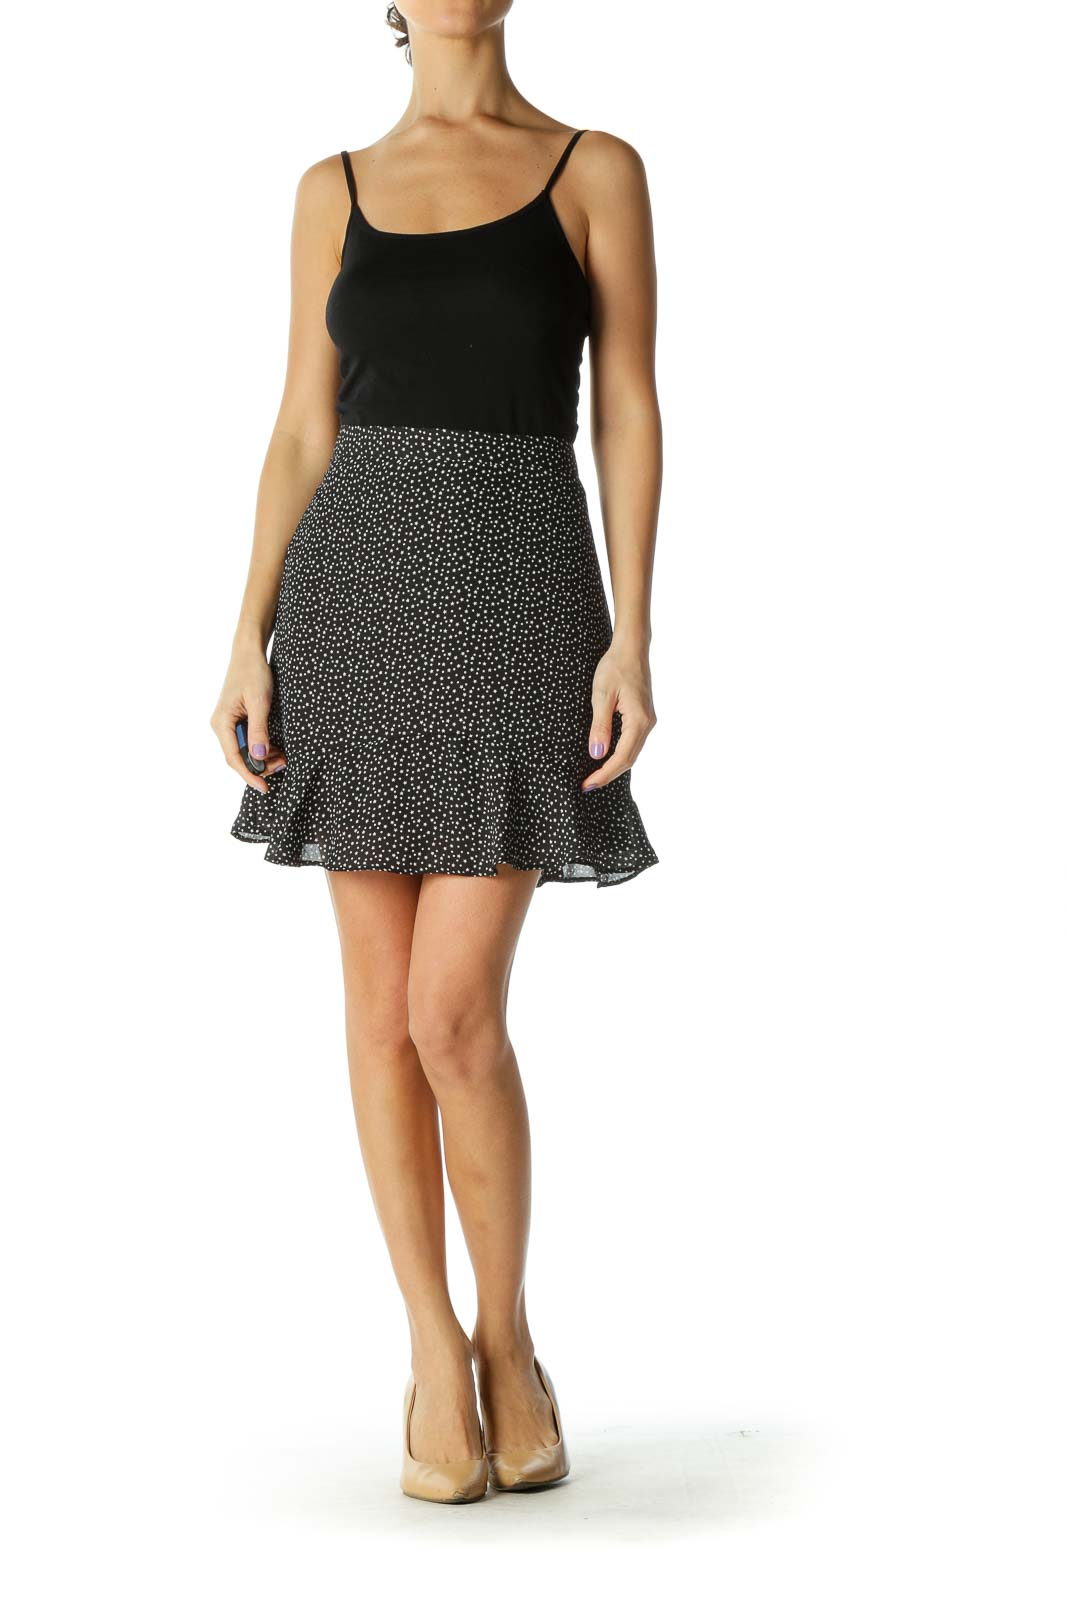 Black Polka Dot Chic A-Line Skirt